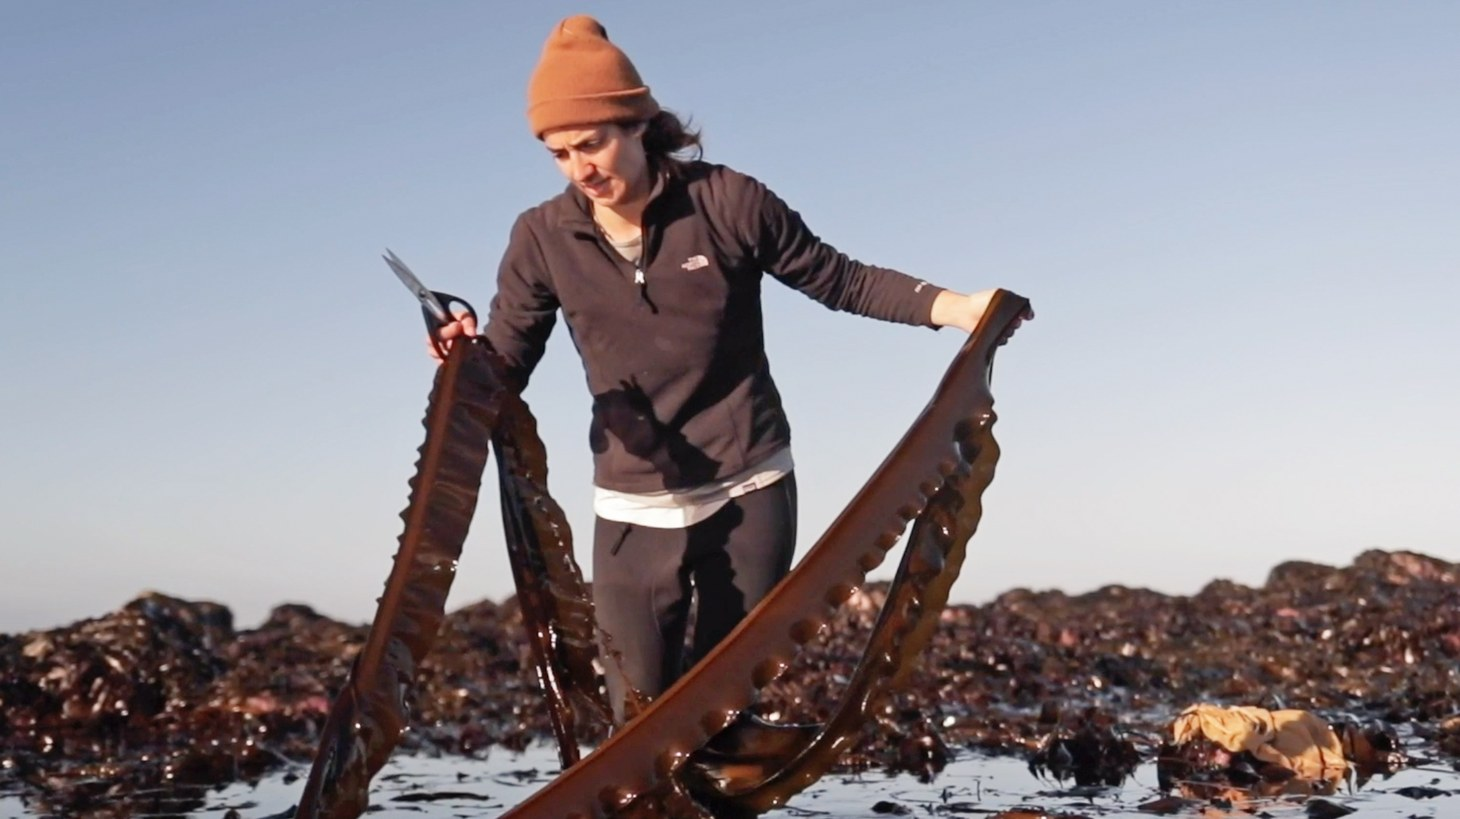 Catherine O'Hare harvesting seaweed.